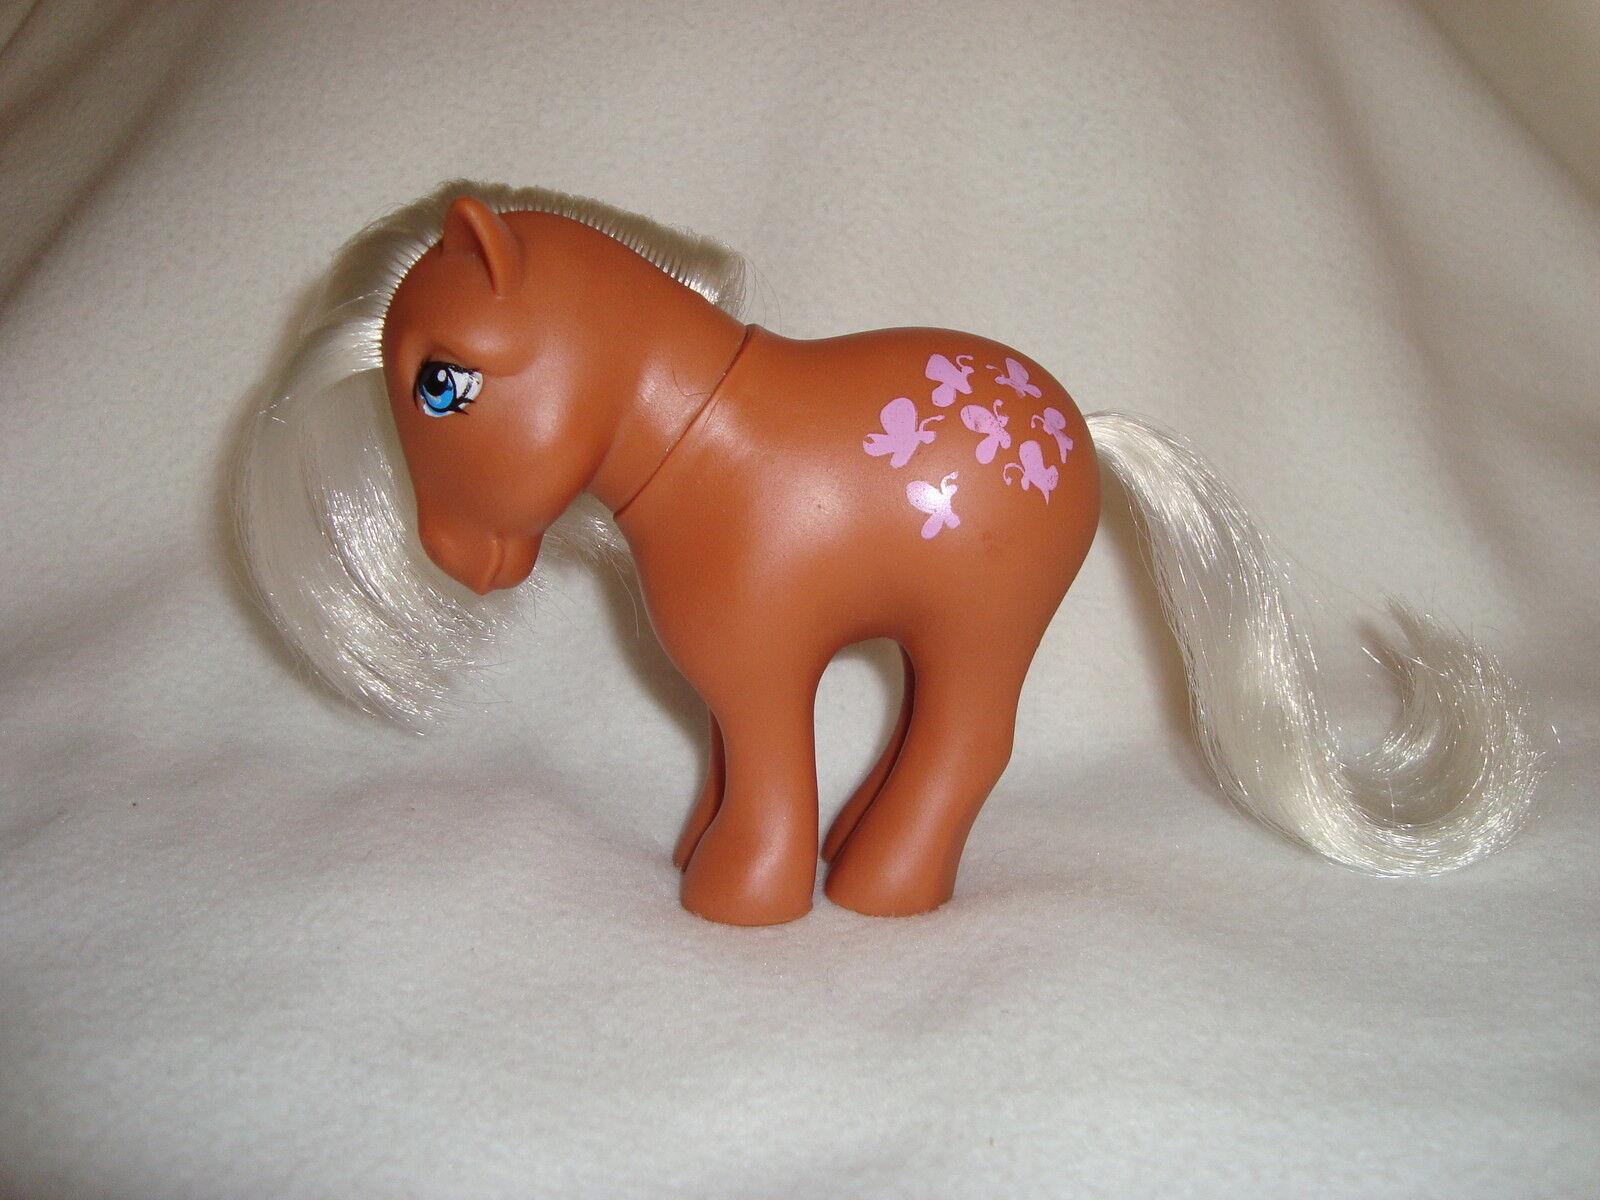 Butterscotch  marron Varia Nirvana Mio Mini Pony My Little Pony SPESE GRATIS